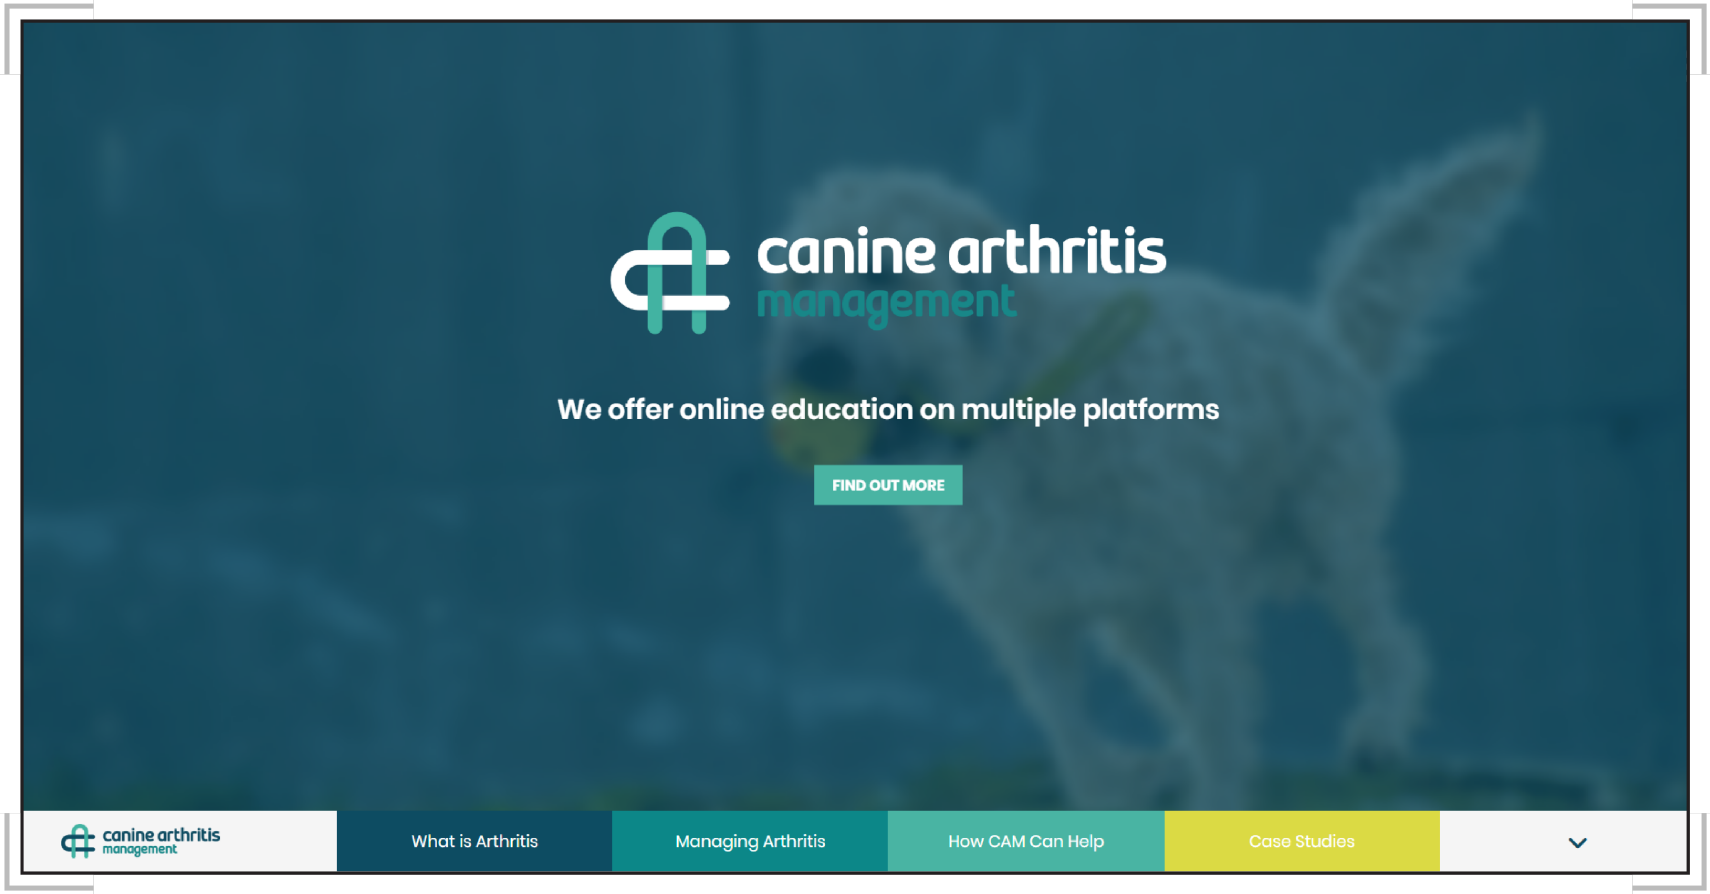 canine_arthritis.png